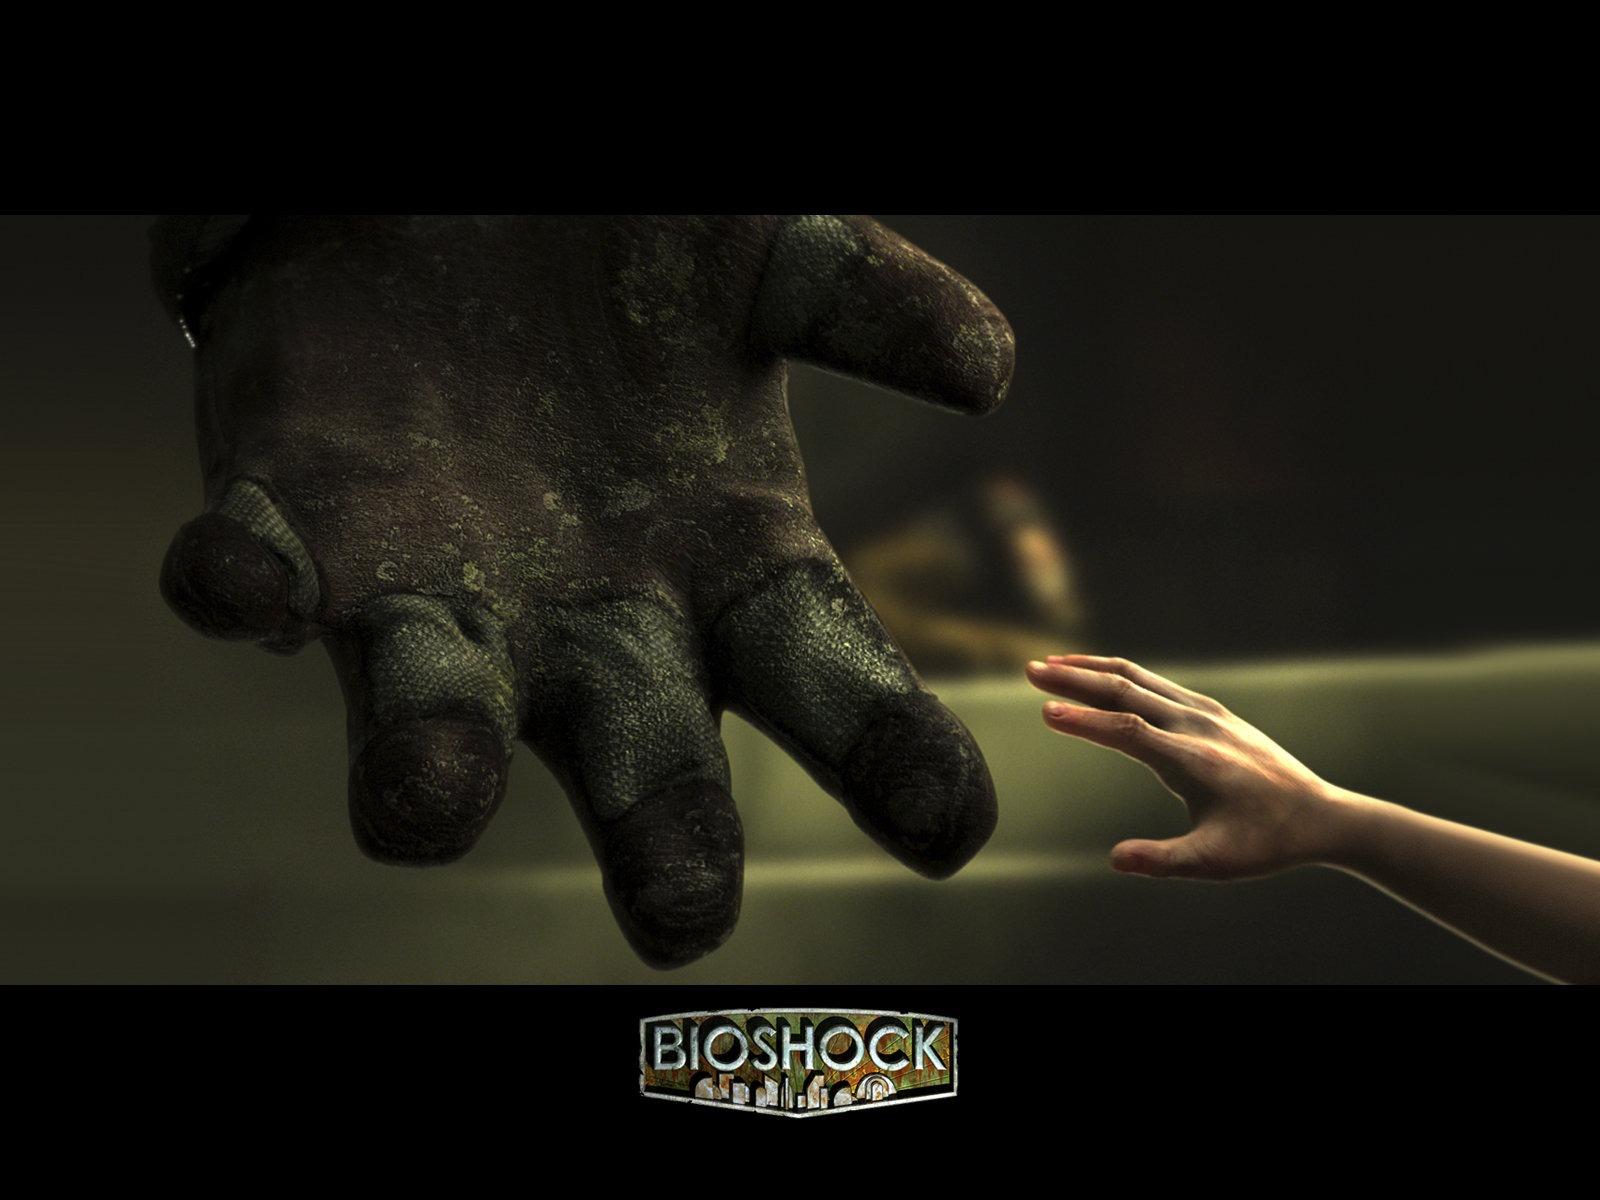 Bioshock Hand Desktop Wallpaper Bioshock Little Sister Big